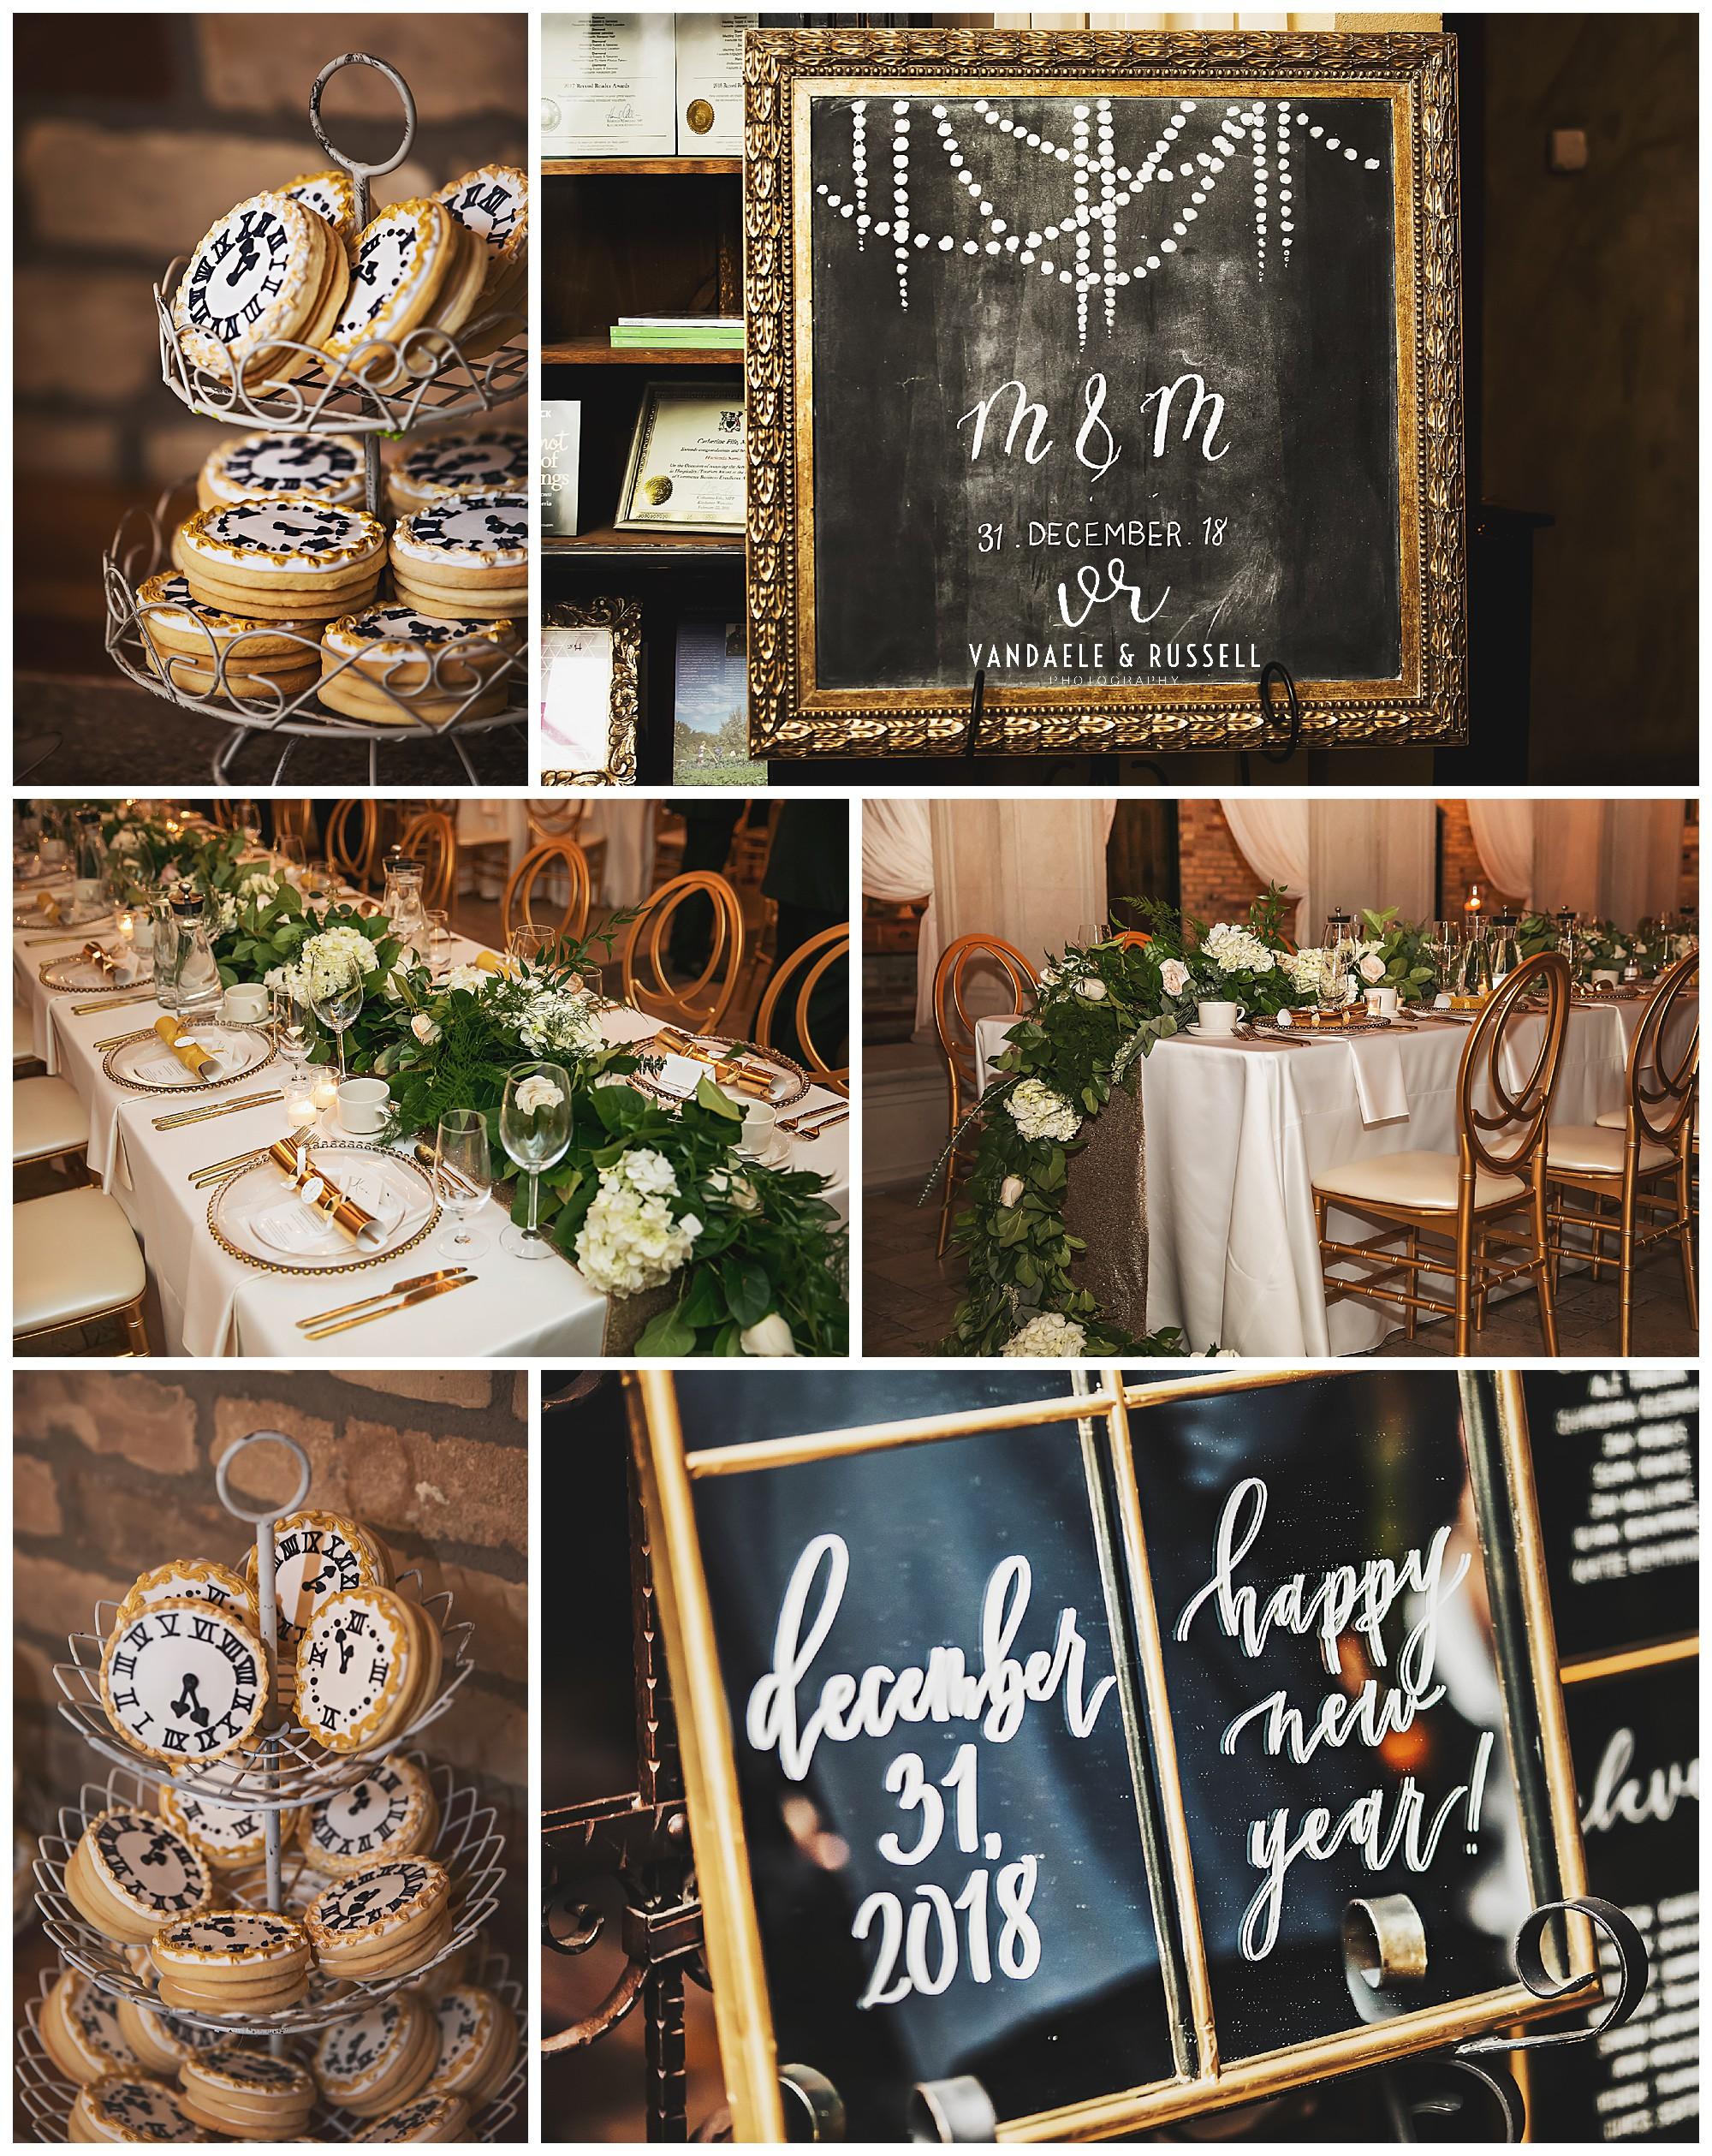 Hacienda-Sarria-Wedding-Photos-NYE-Michelle-Matt-VanDaele-Russell_0037.jpg